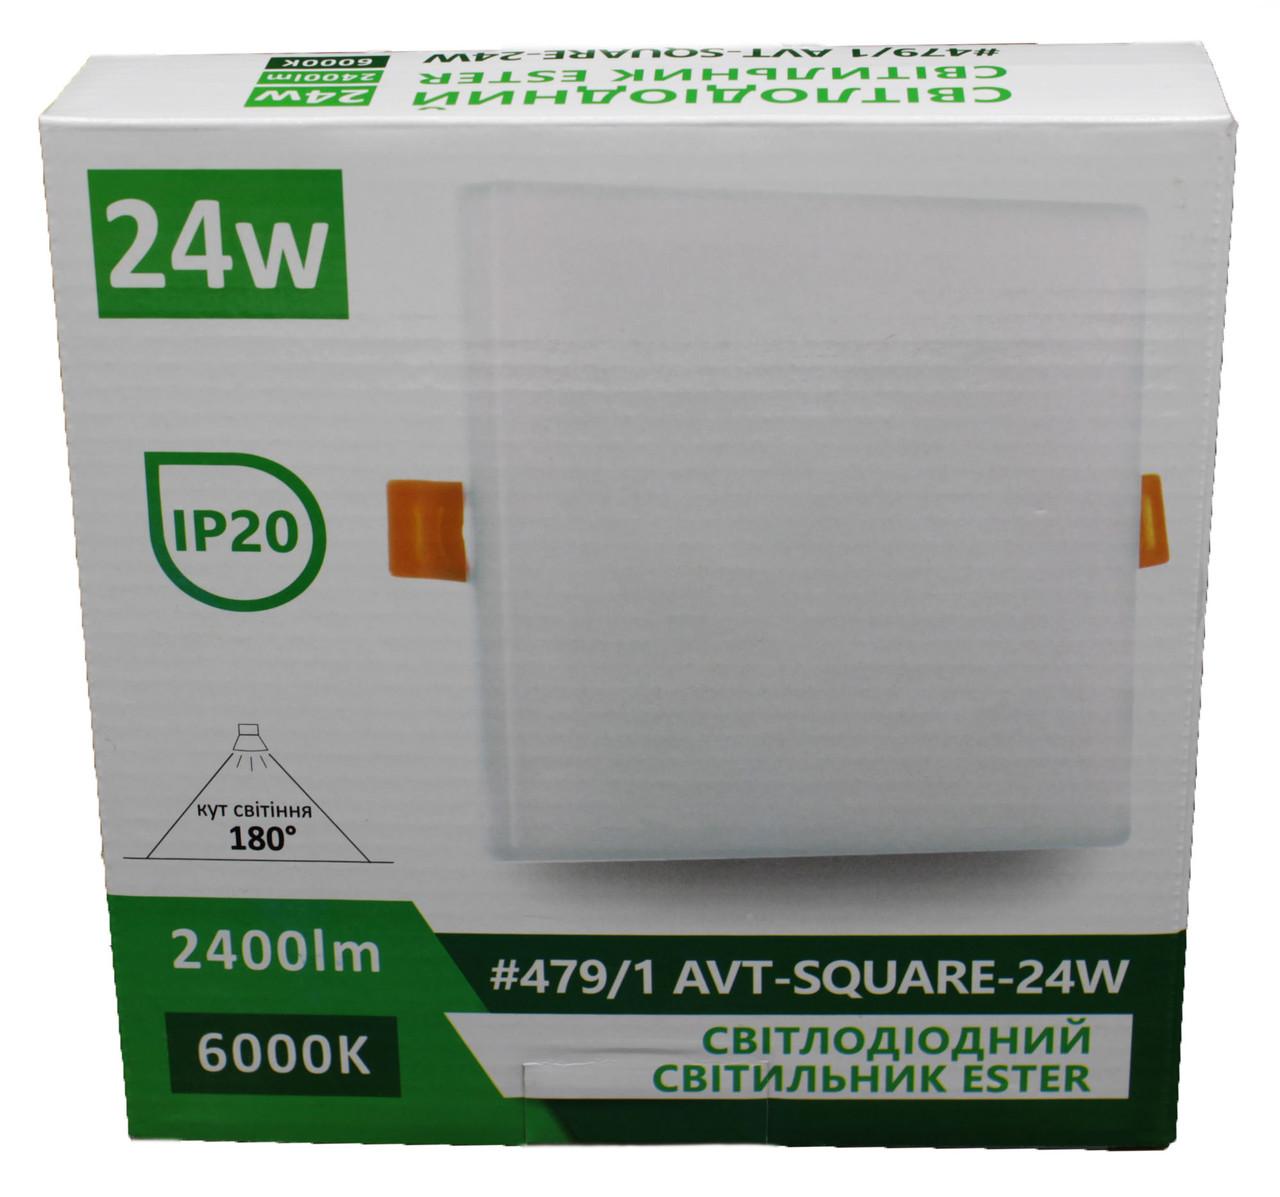 #479/1 AVT-SQUARE ESTER-24W Pure White Светодиодный светильник